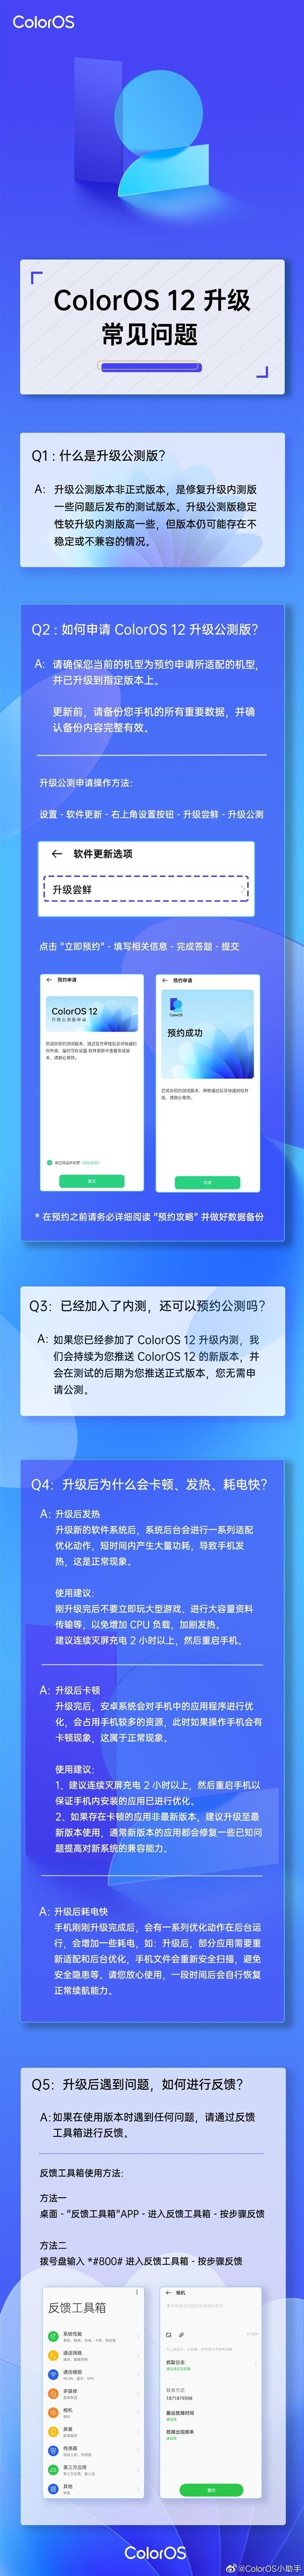 首批适配Android 12!ColorOS 12公测说明:大批机型升级